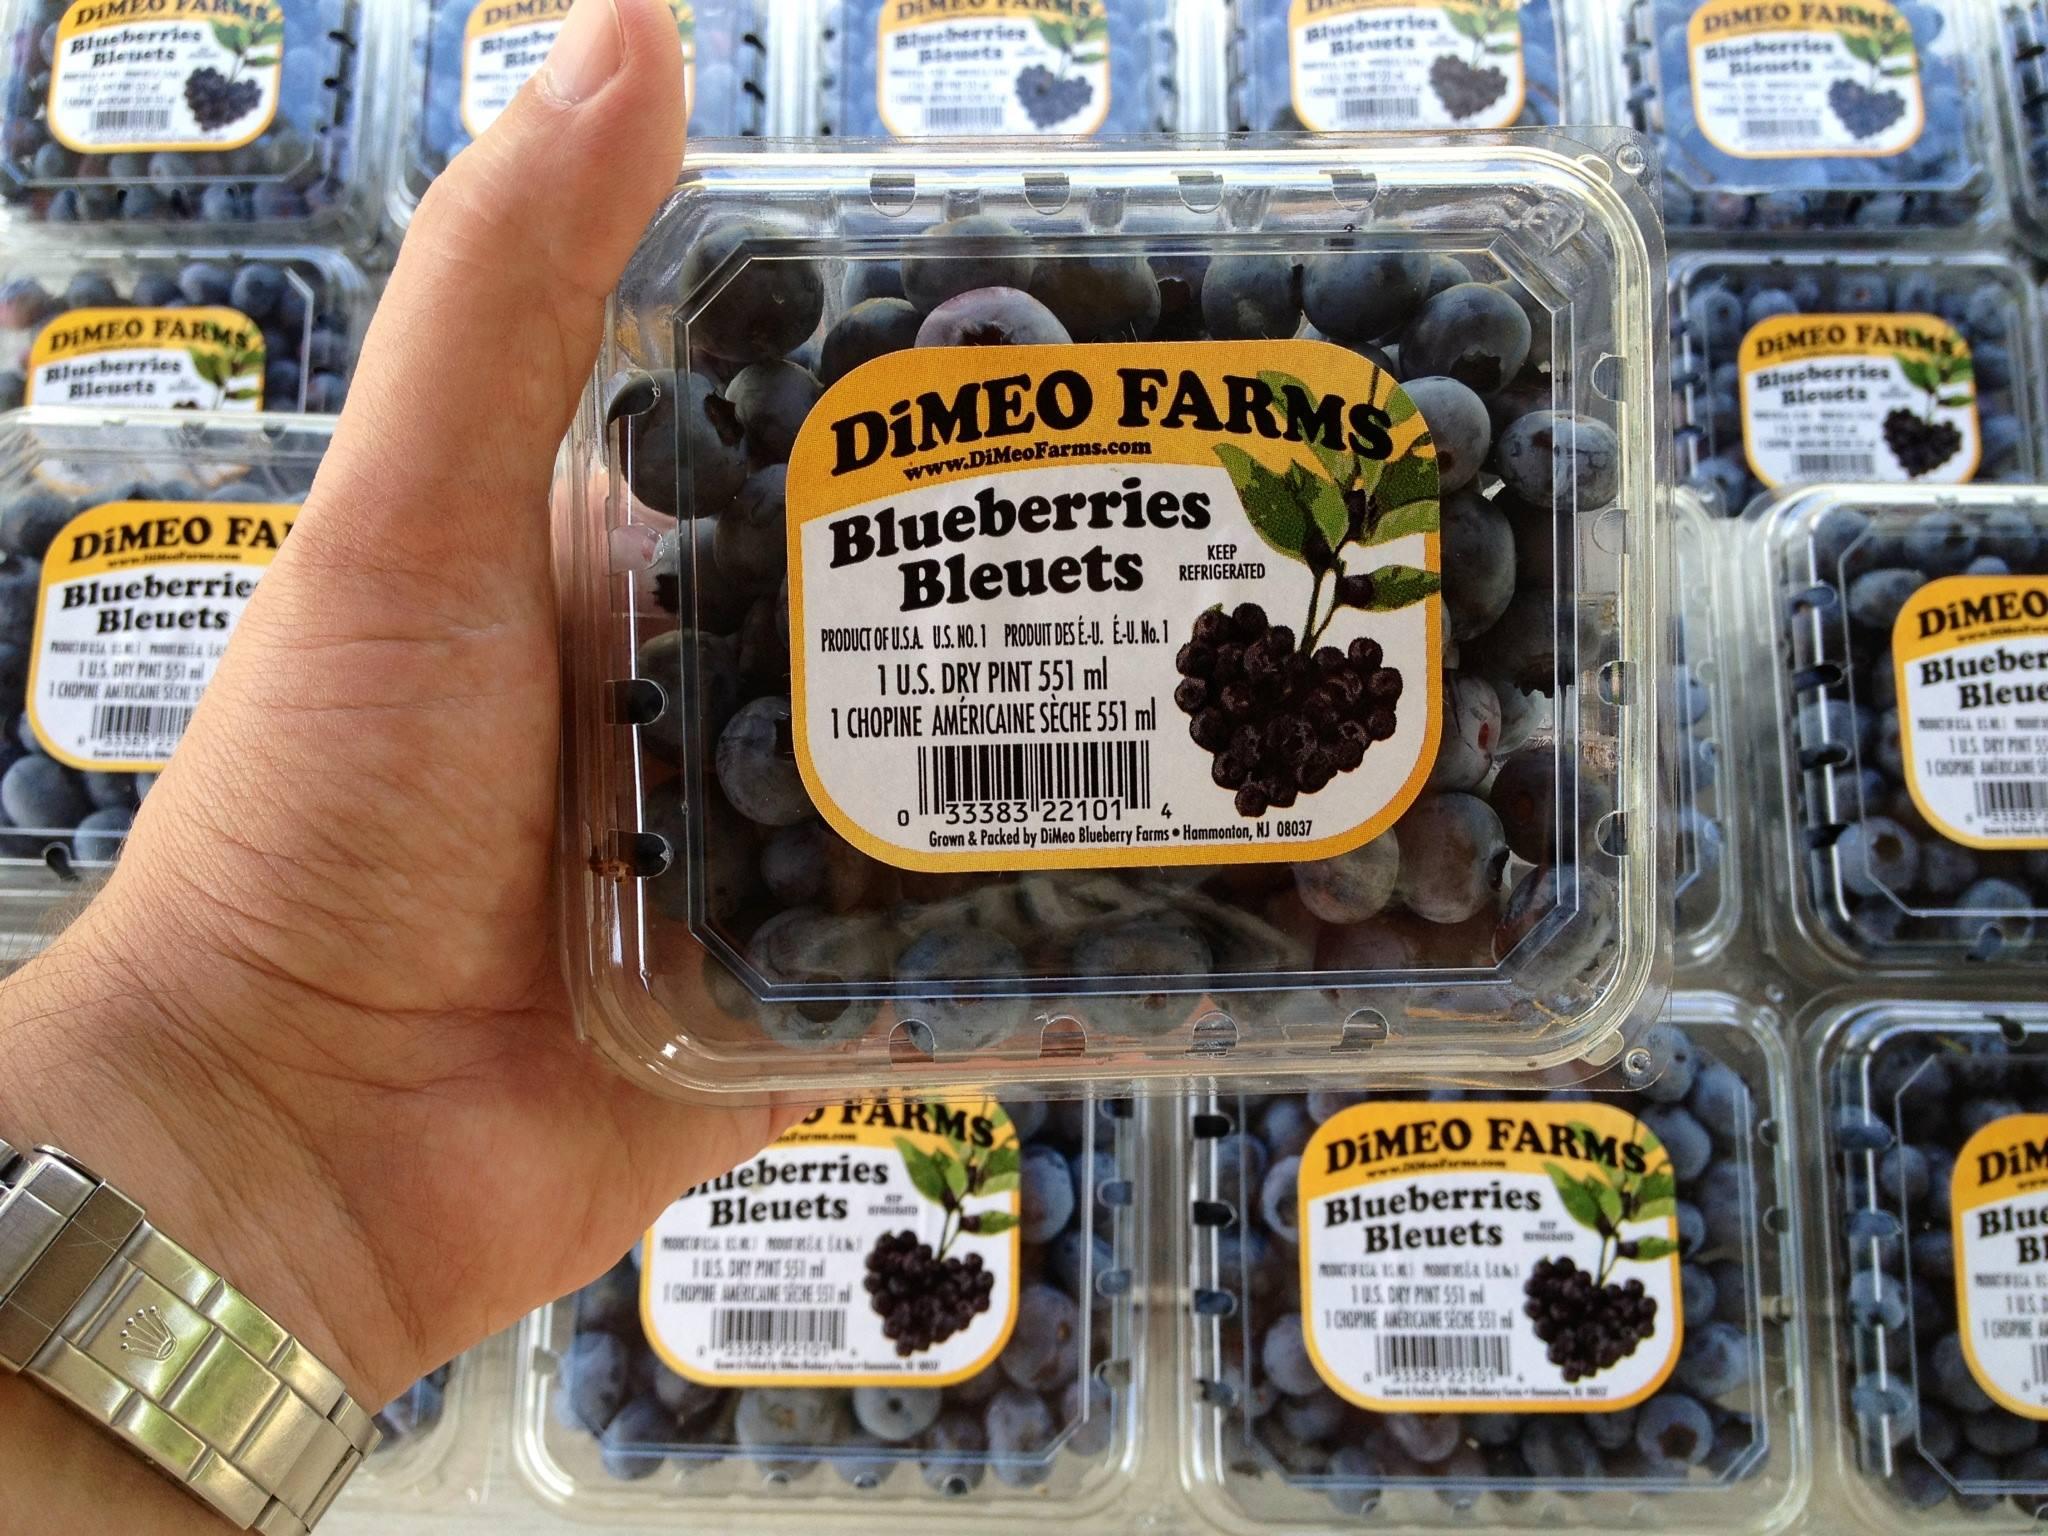 DiMeo Farms Blueberries New Jersey Blueberry Farm.jpg